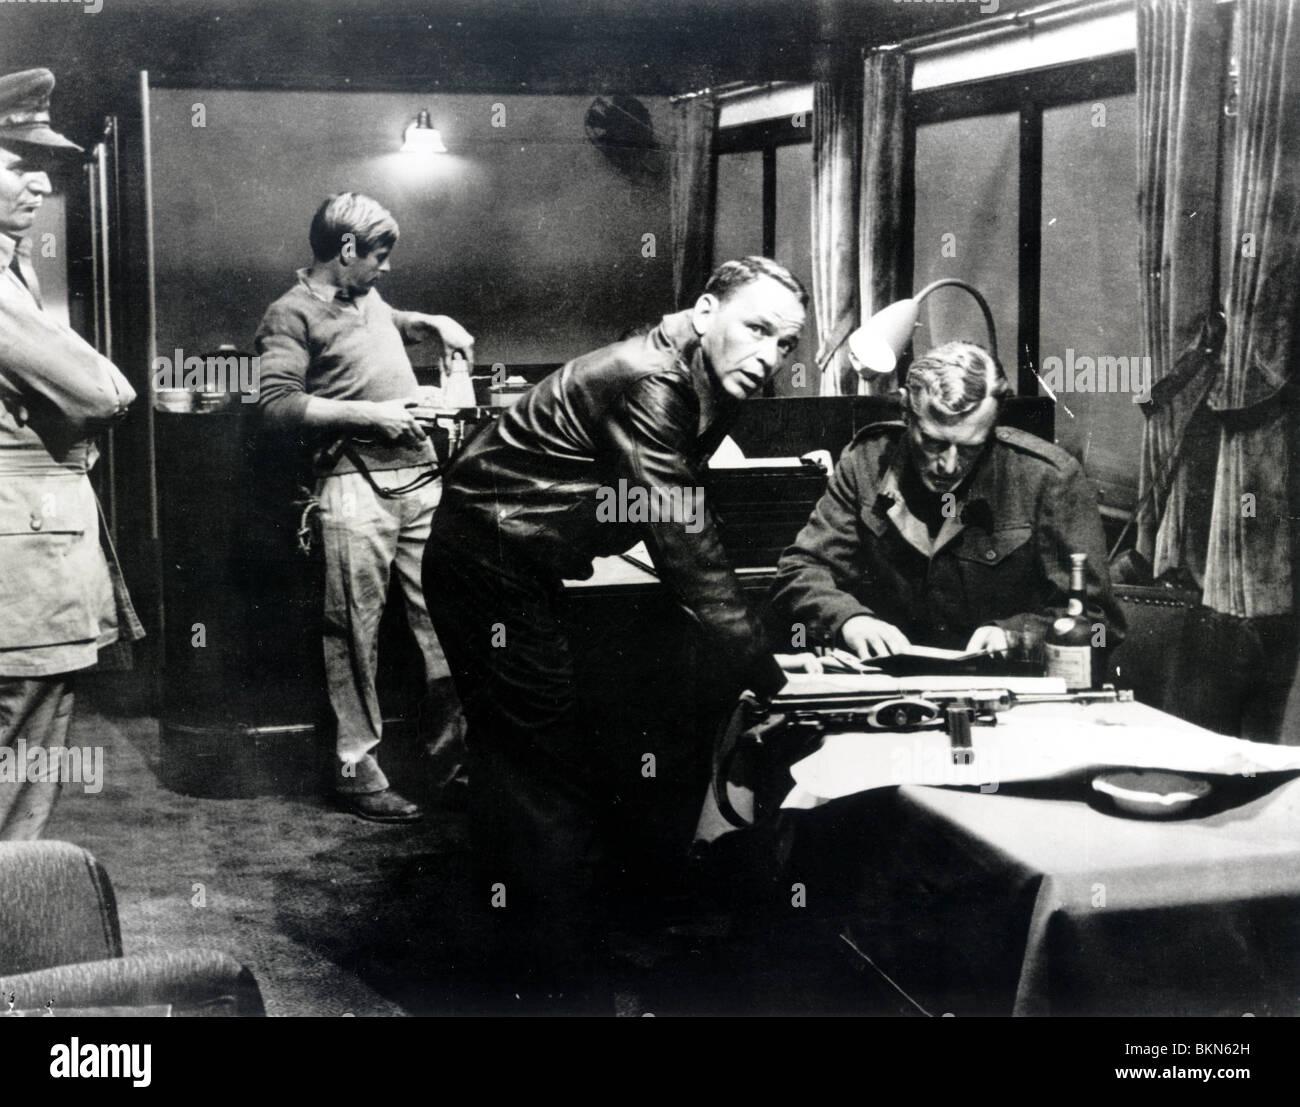 Stock photo von ryans express 1965 trevor howard frank sinatra edward mulhare vrex 005 p